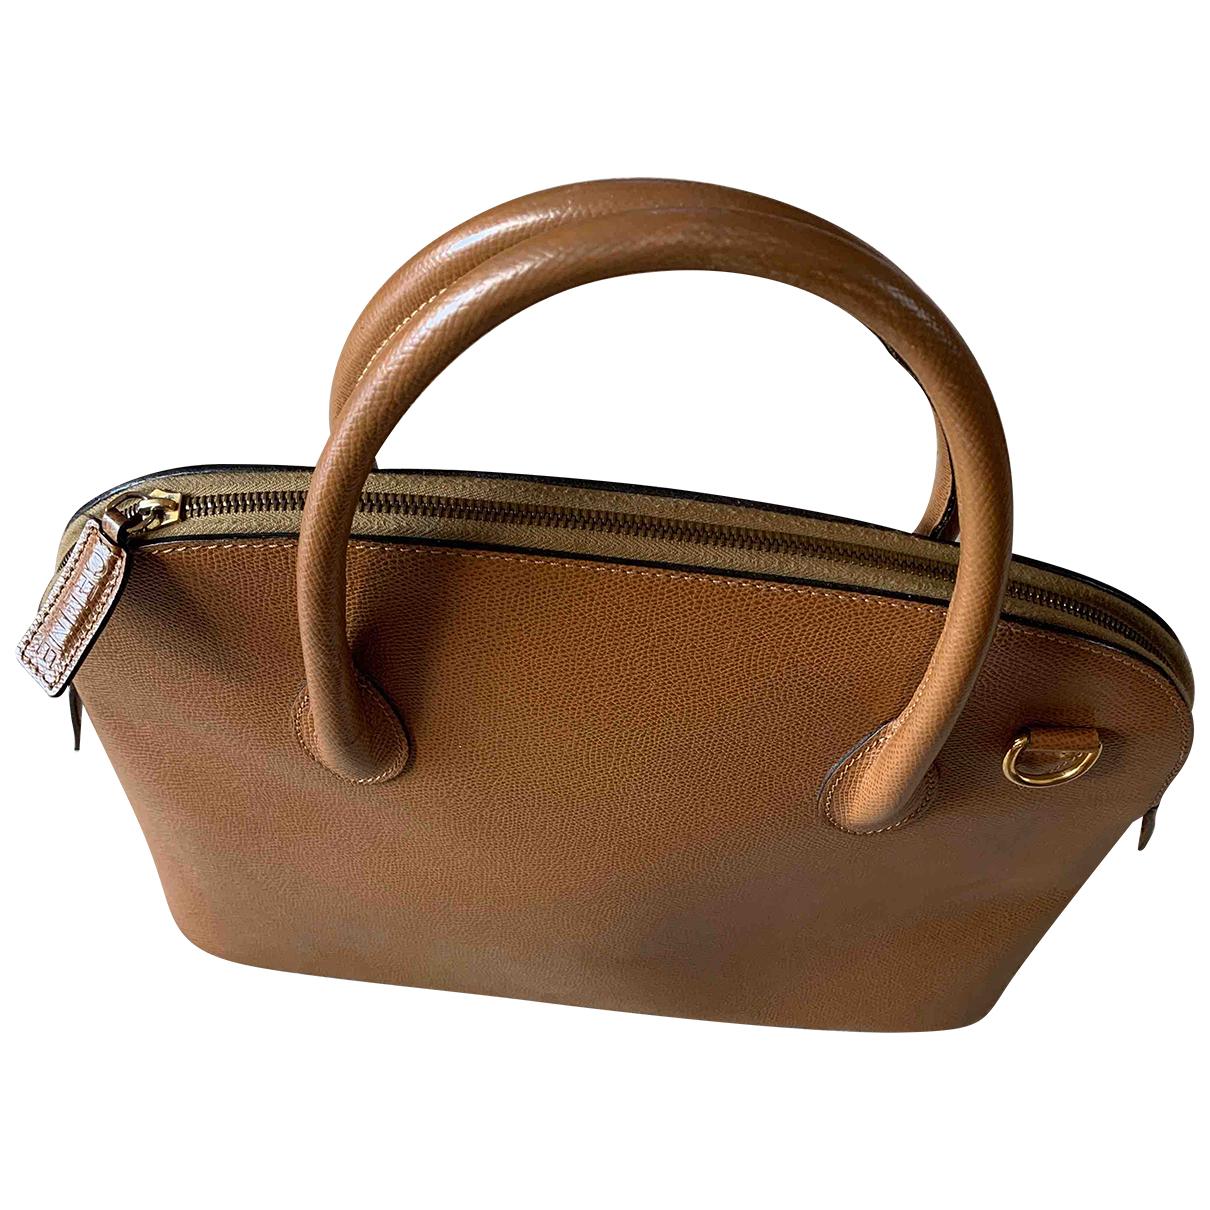 Celine \N Camel Leather handbag for Women \N